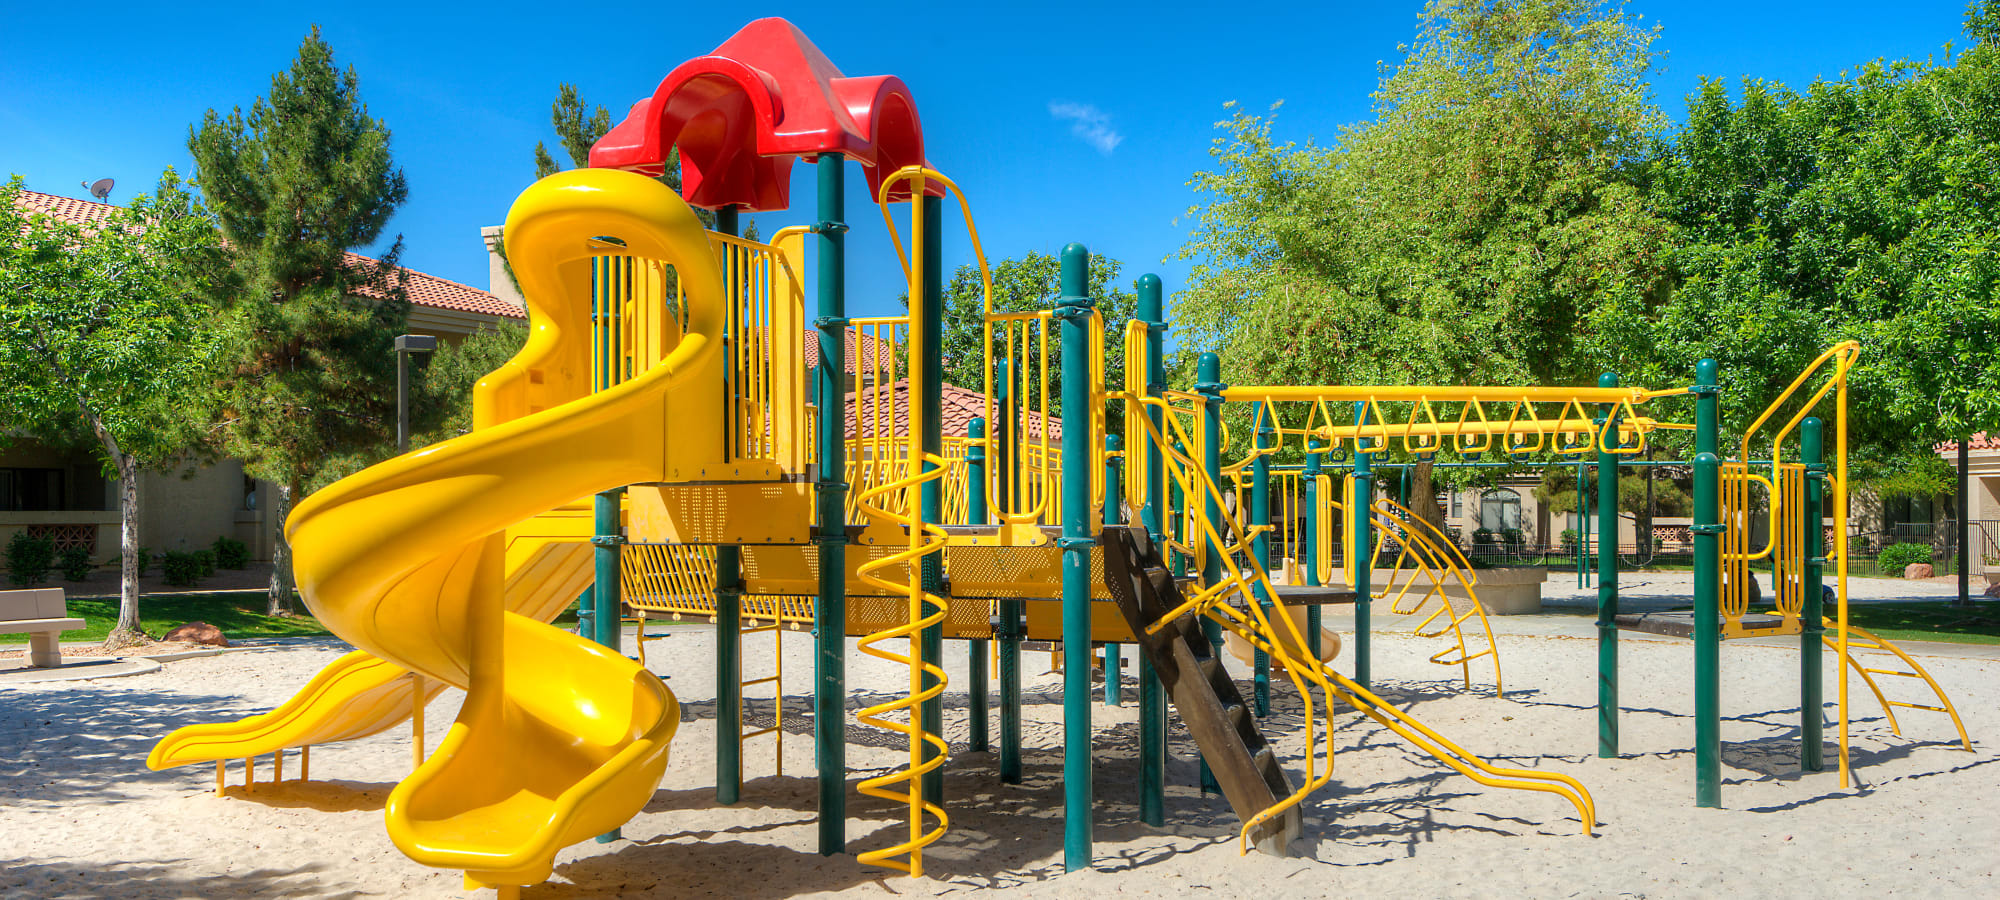 Onsite children's playground at San Pedregal in Phoenix, Arizona